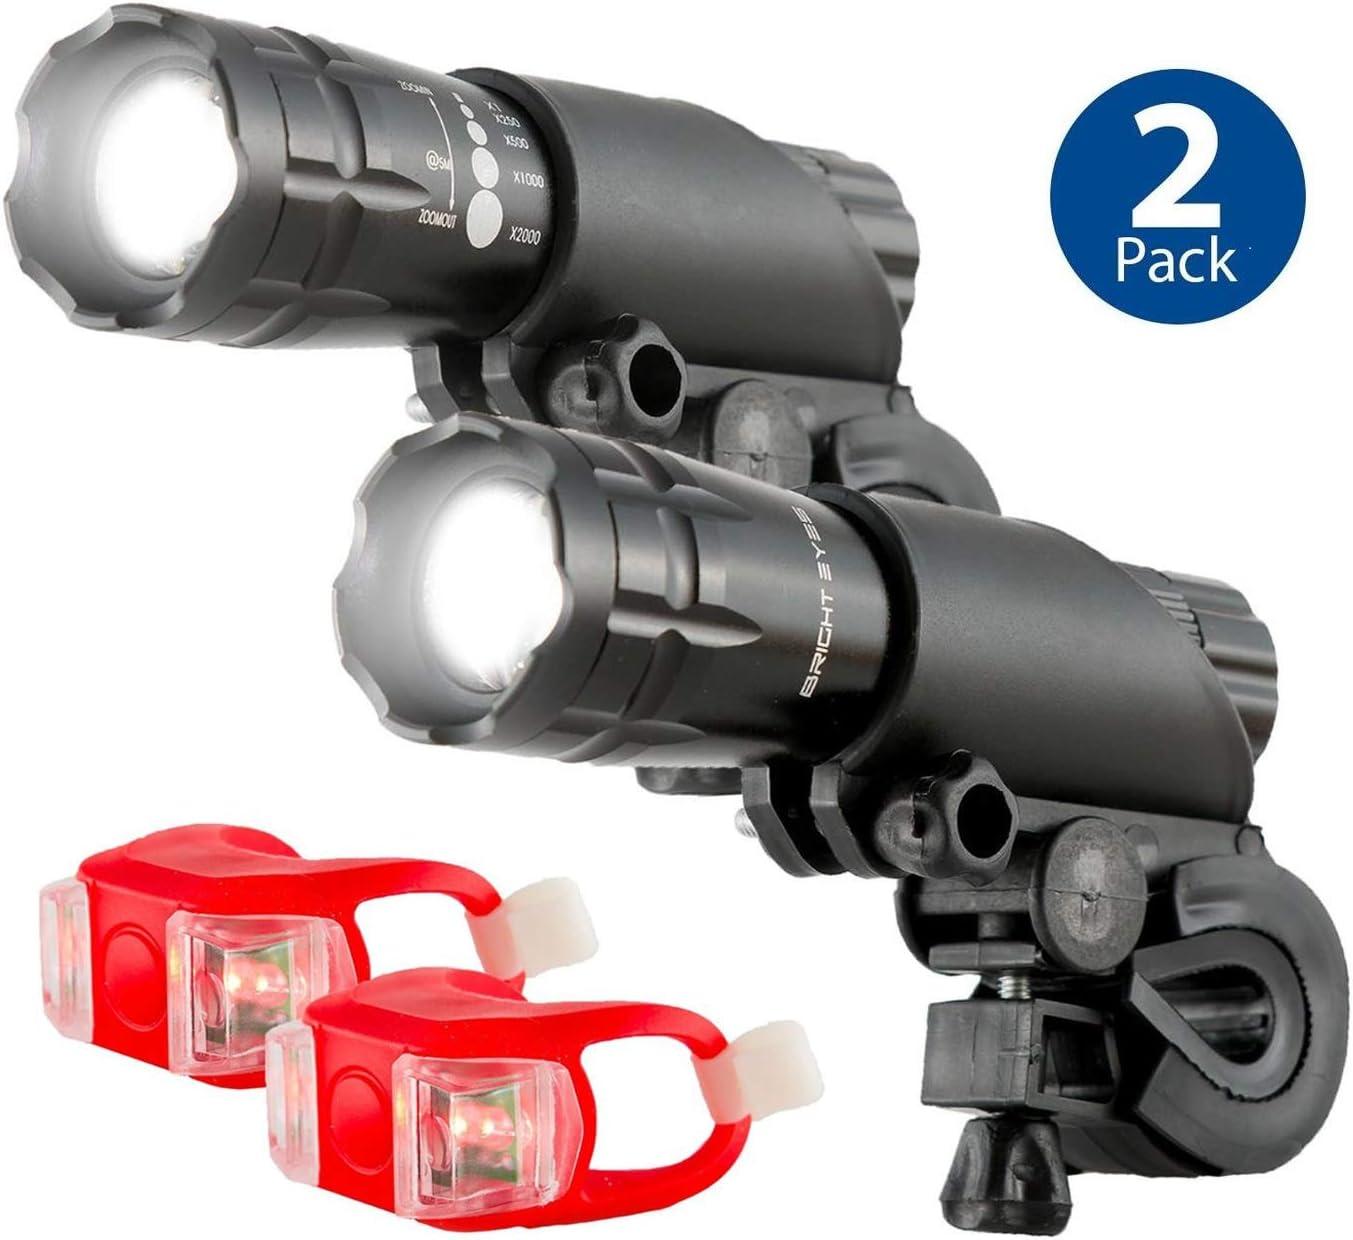 Bright Eyes Aircraft Aluminium Waterproof 300 Lumen LED Bike Light Set Headlight, TailLight , 2 Pack